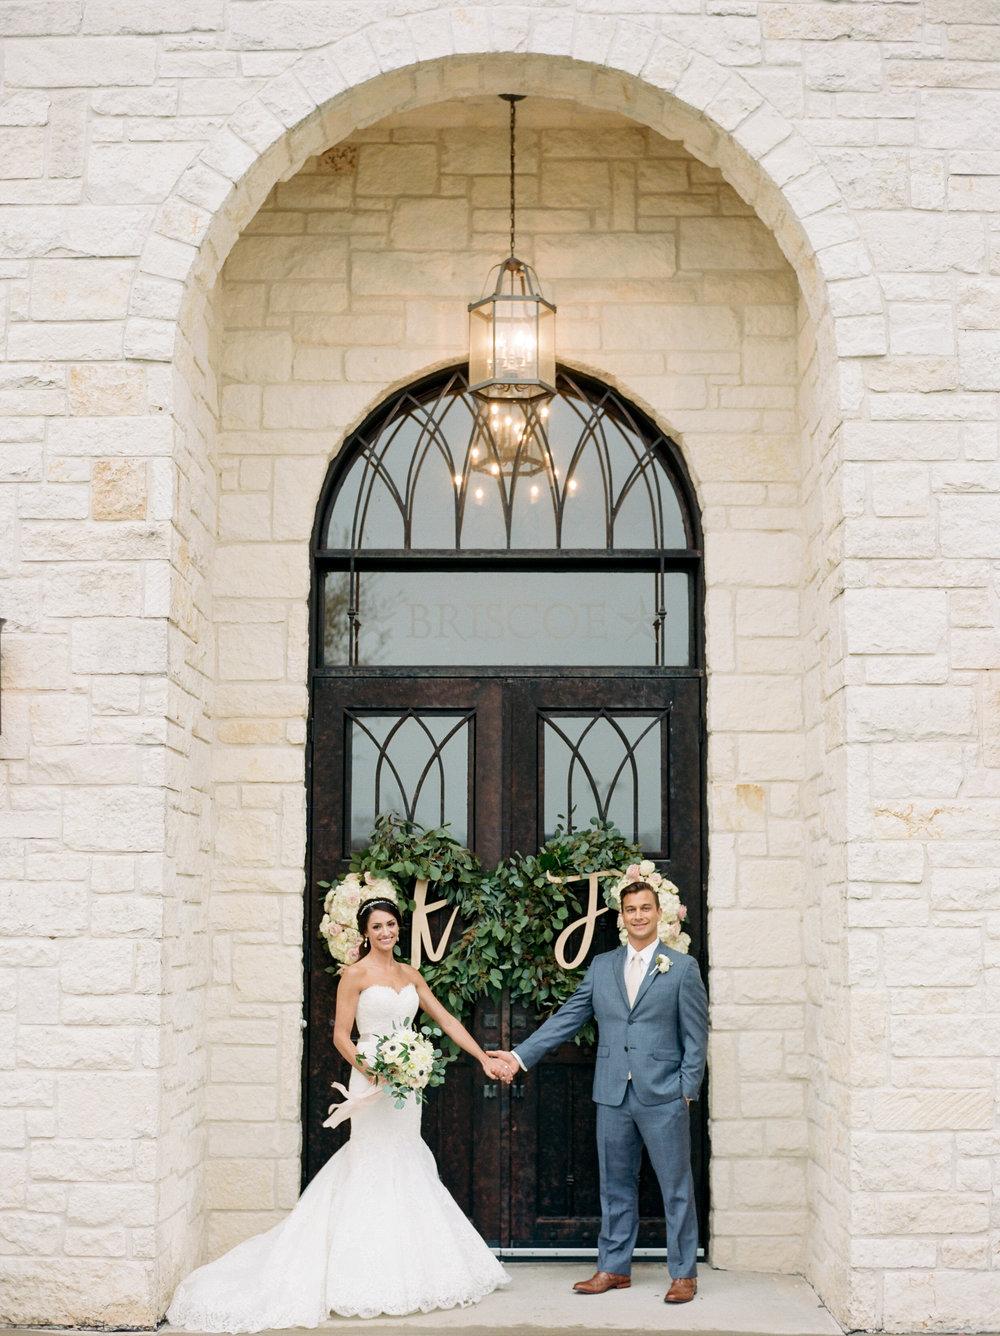 Briscoe-Manor-Houston-Wedding-Photographer-Modern-Luxury-Weddings-Dana-Fernandez-Photograpy-Fine-Art-Photographer-Houston-Film-Destination-PNW-Wedding-Photographer-9.jpg